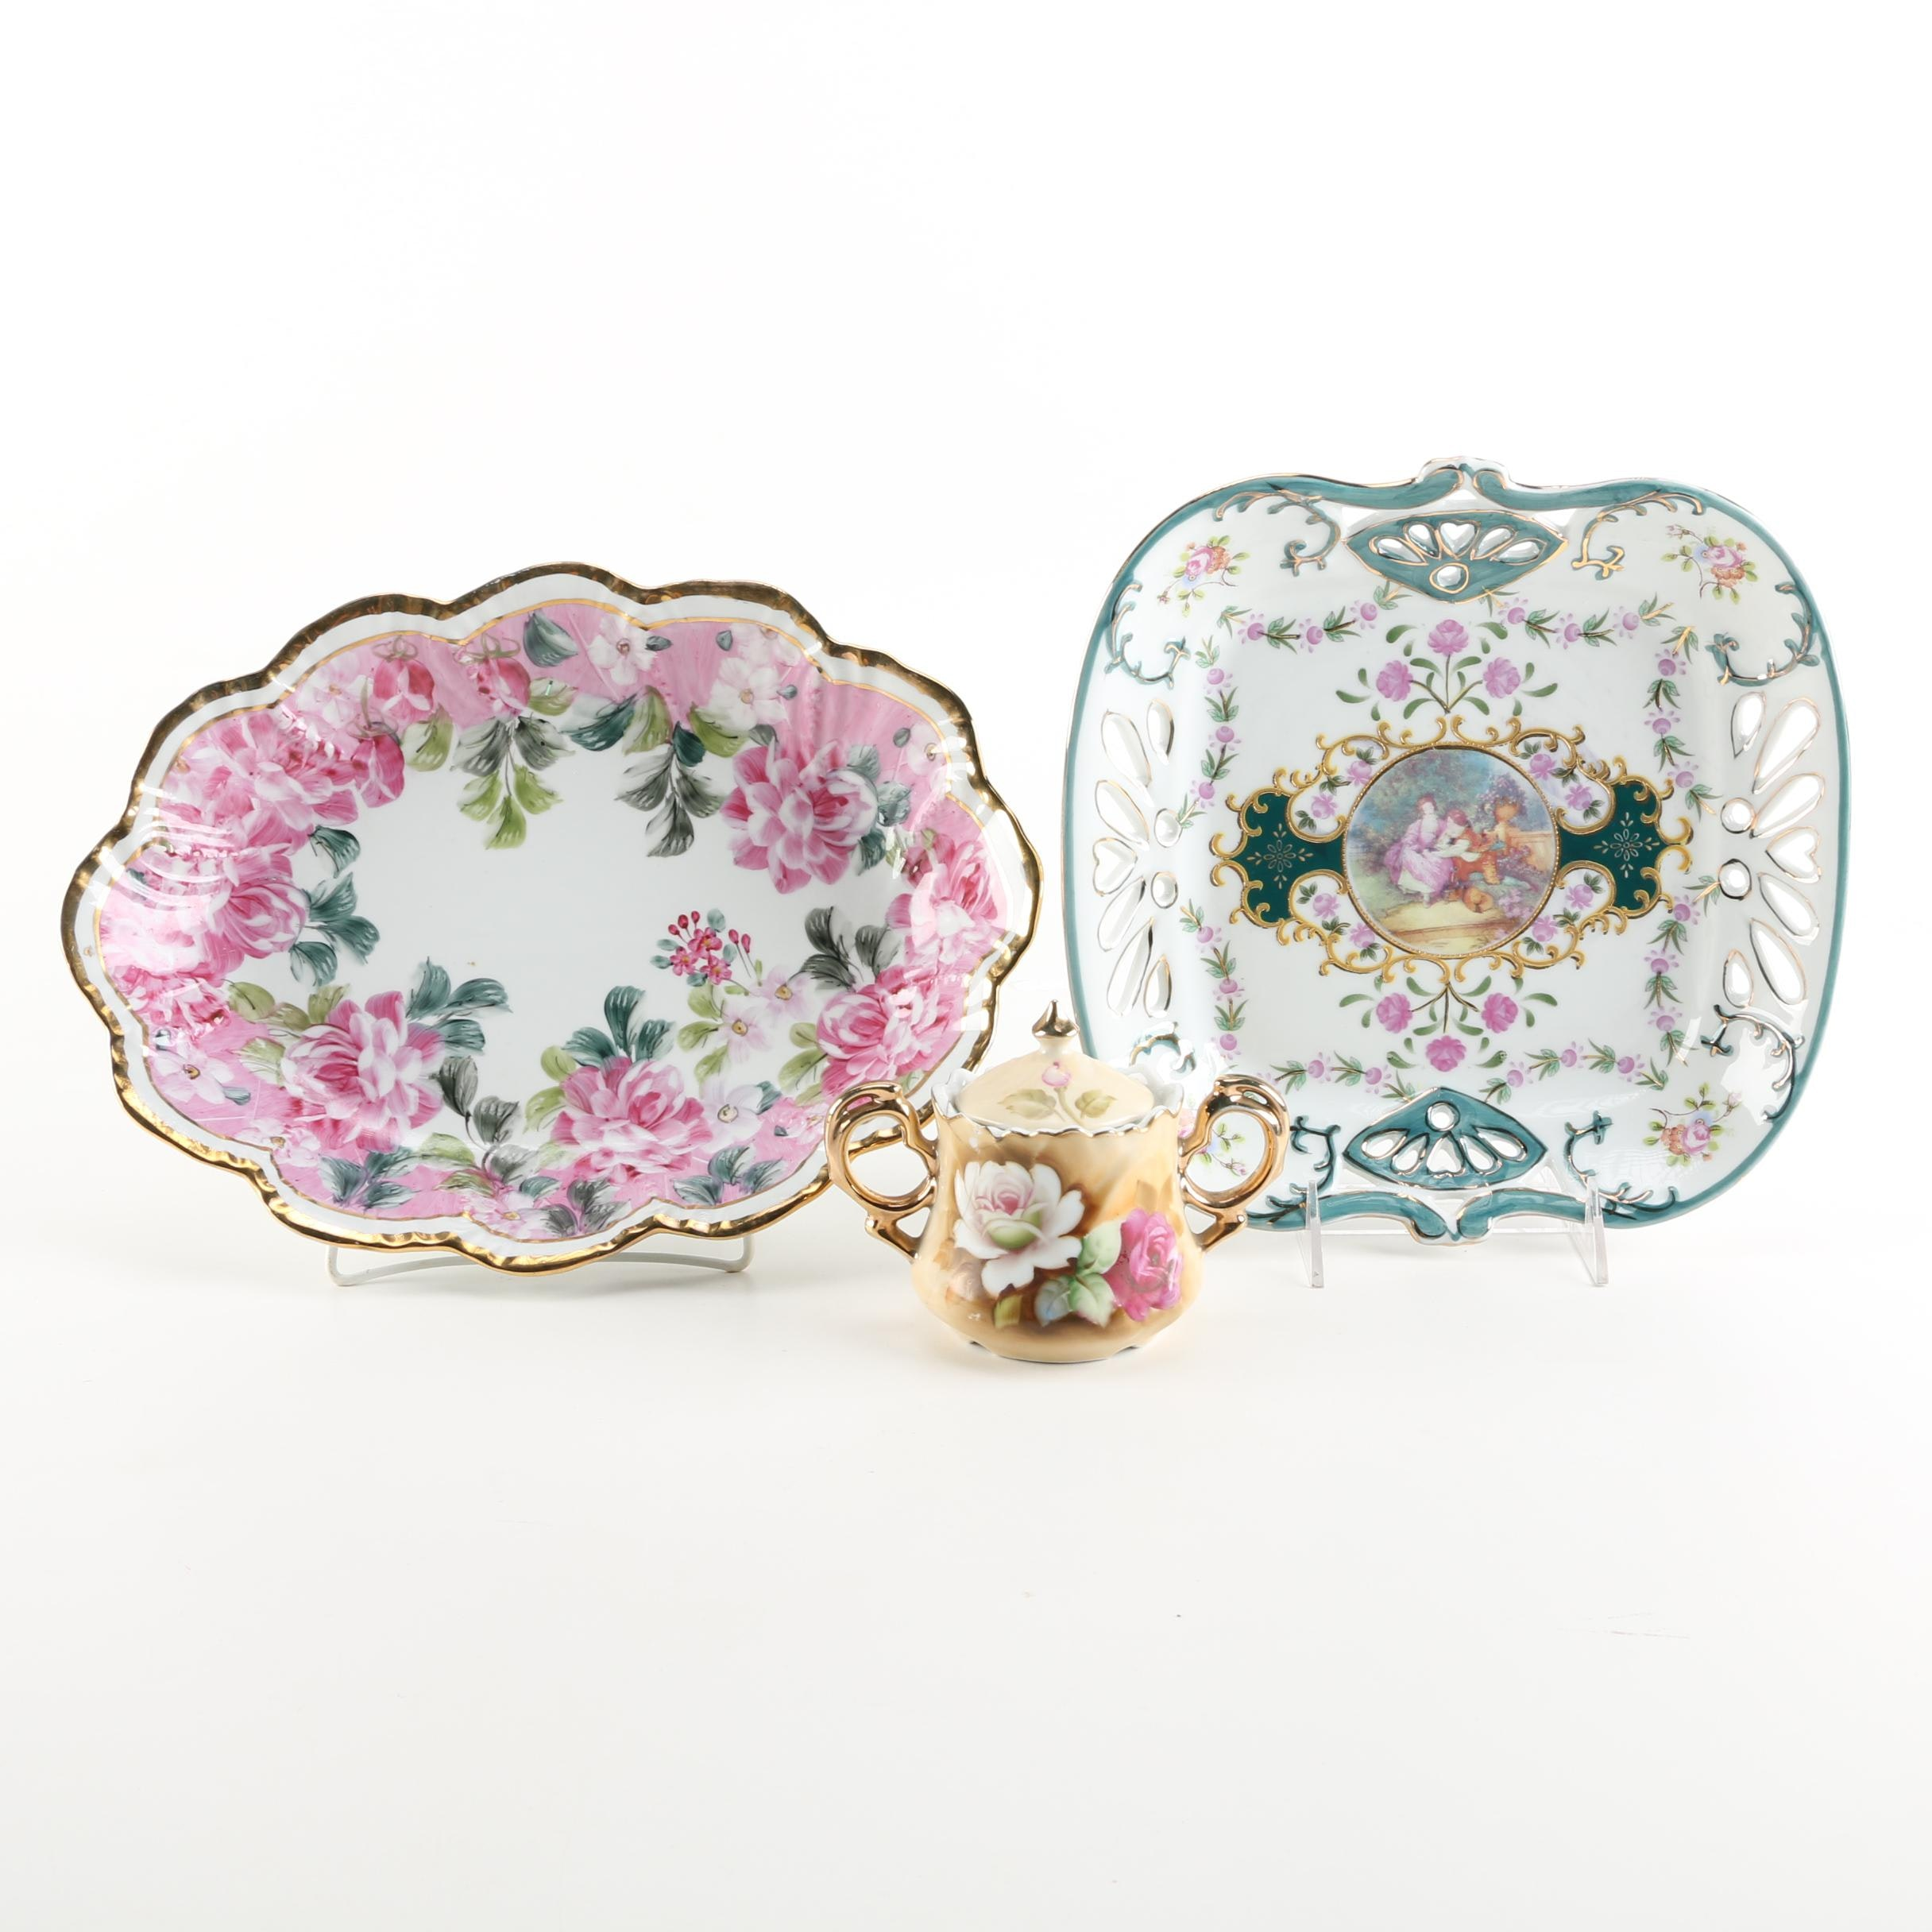 Assortment of Decorative Plates and a Sugar Bowl Including Lefton